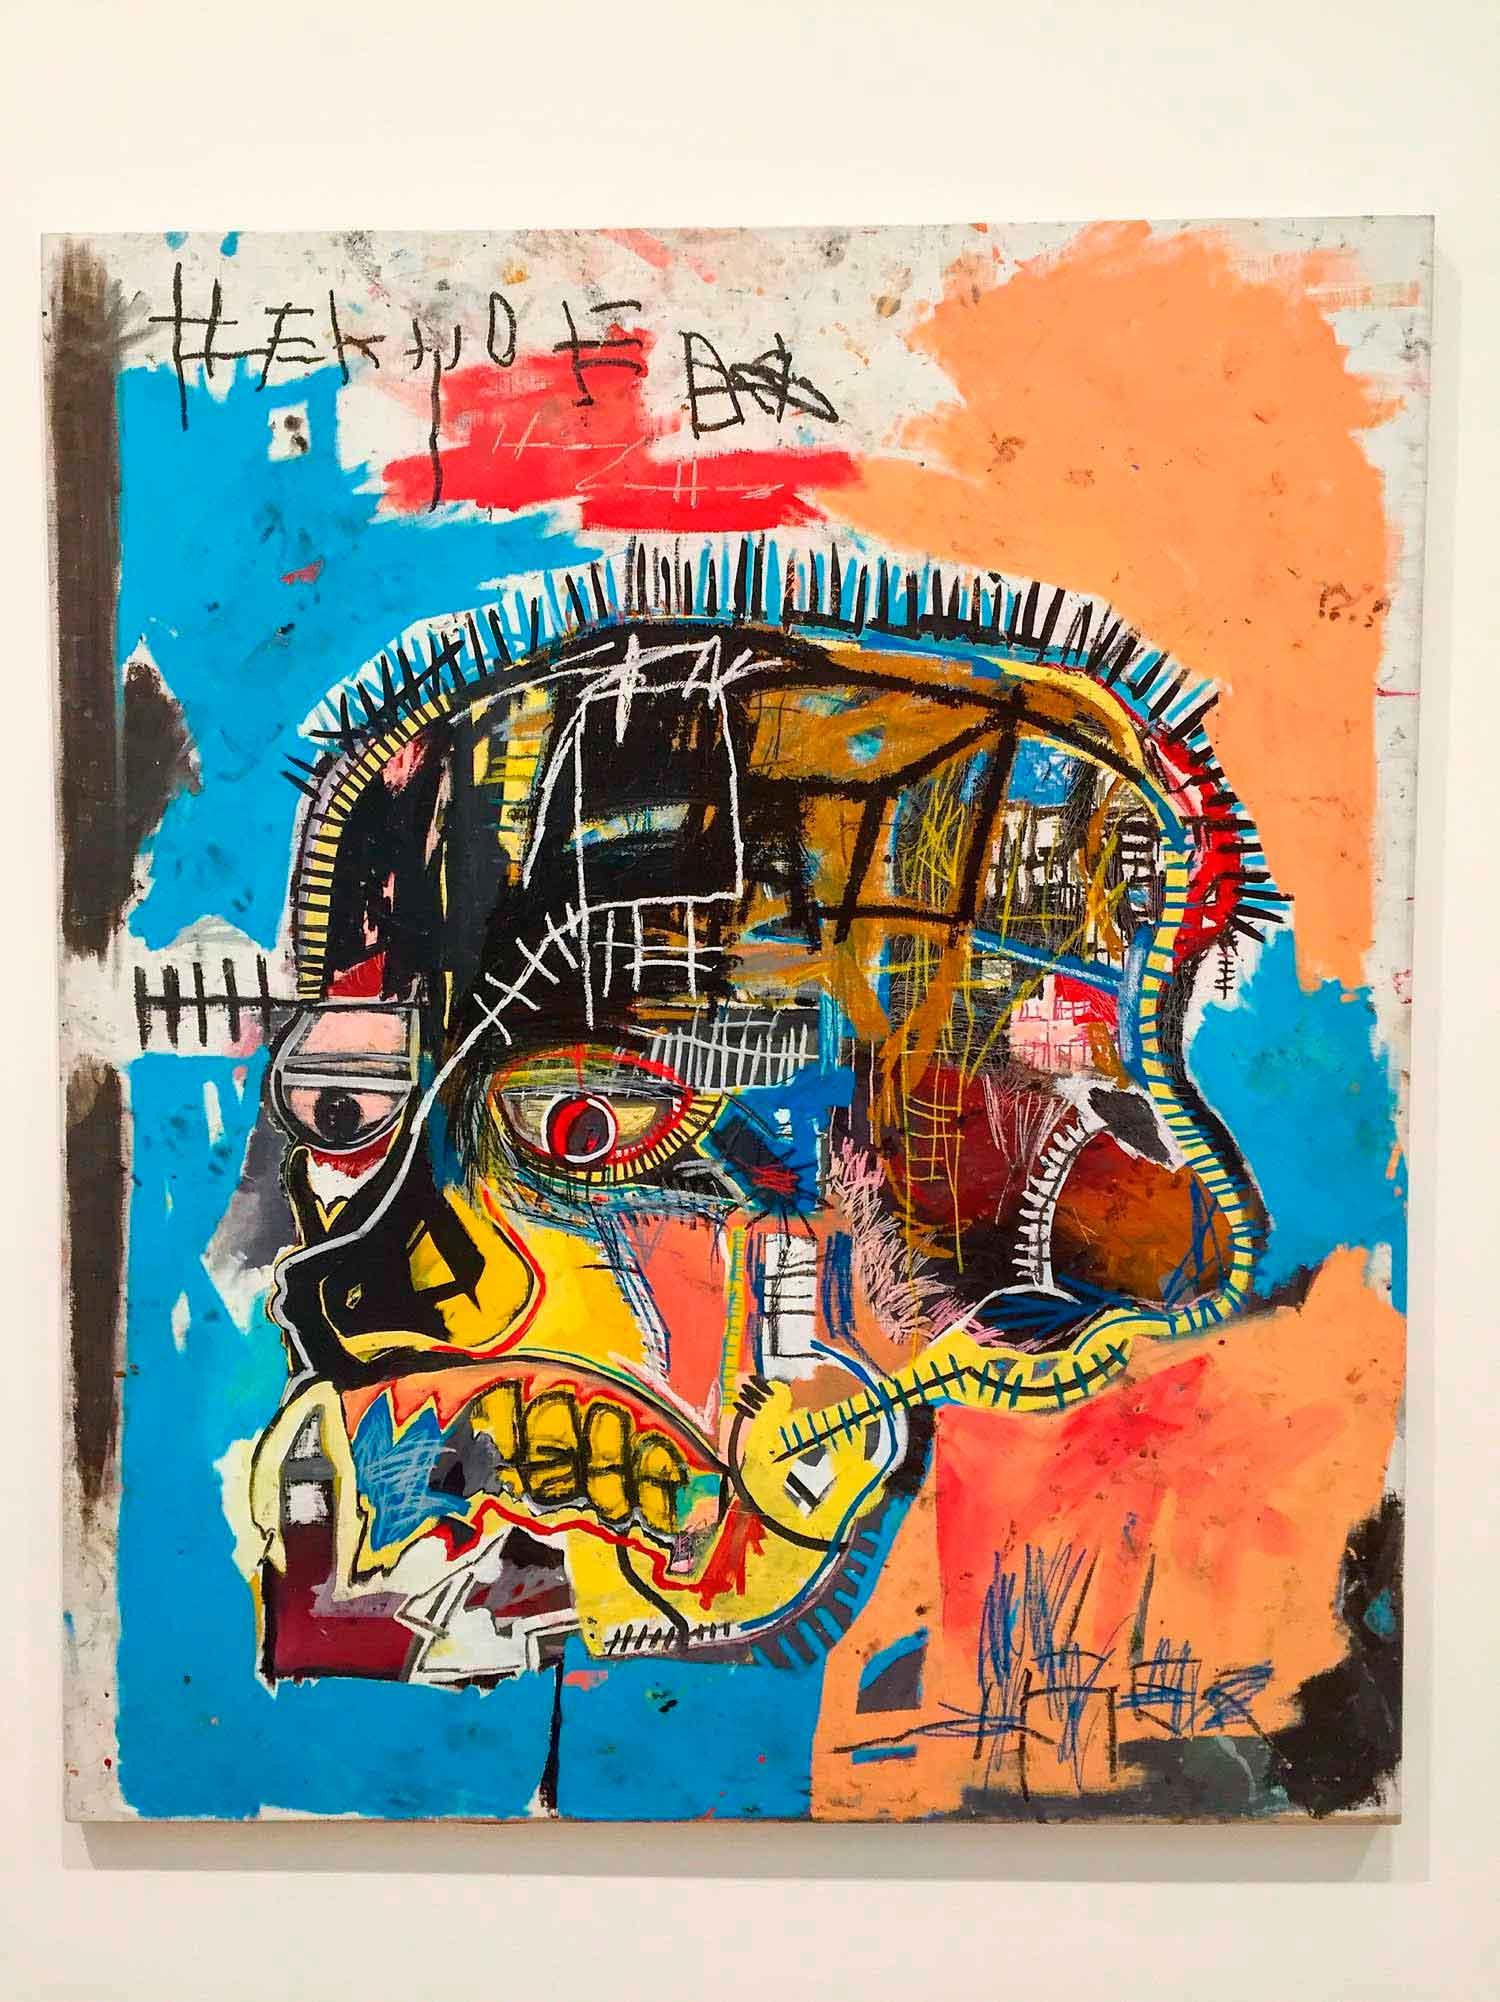 Untitled 1981 by Jean-Michel Basquiat